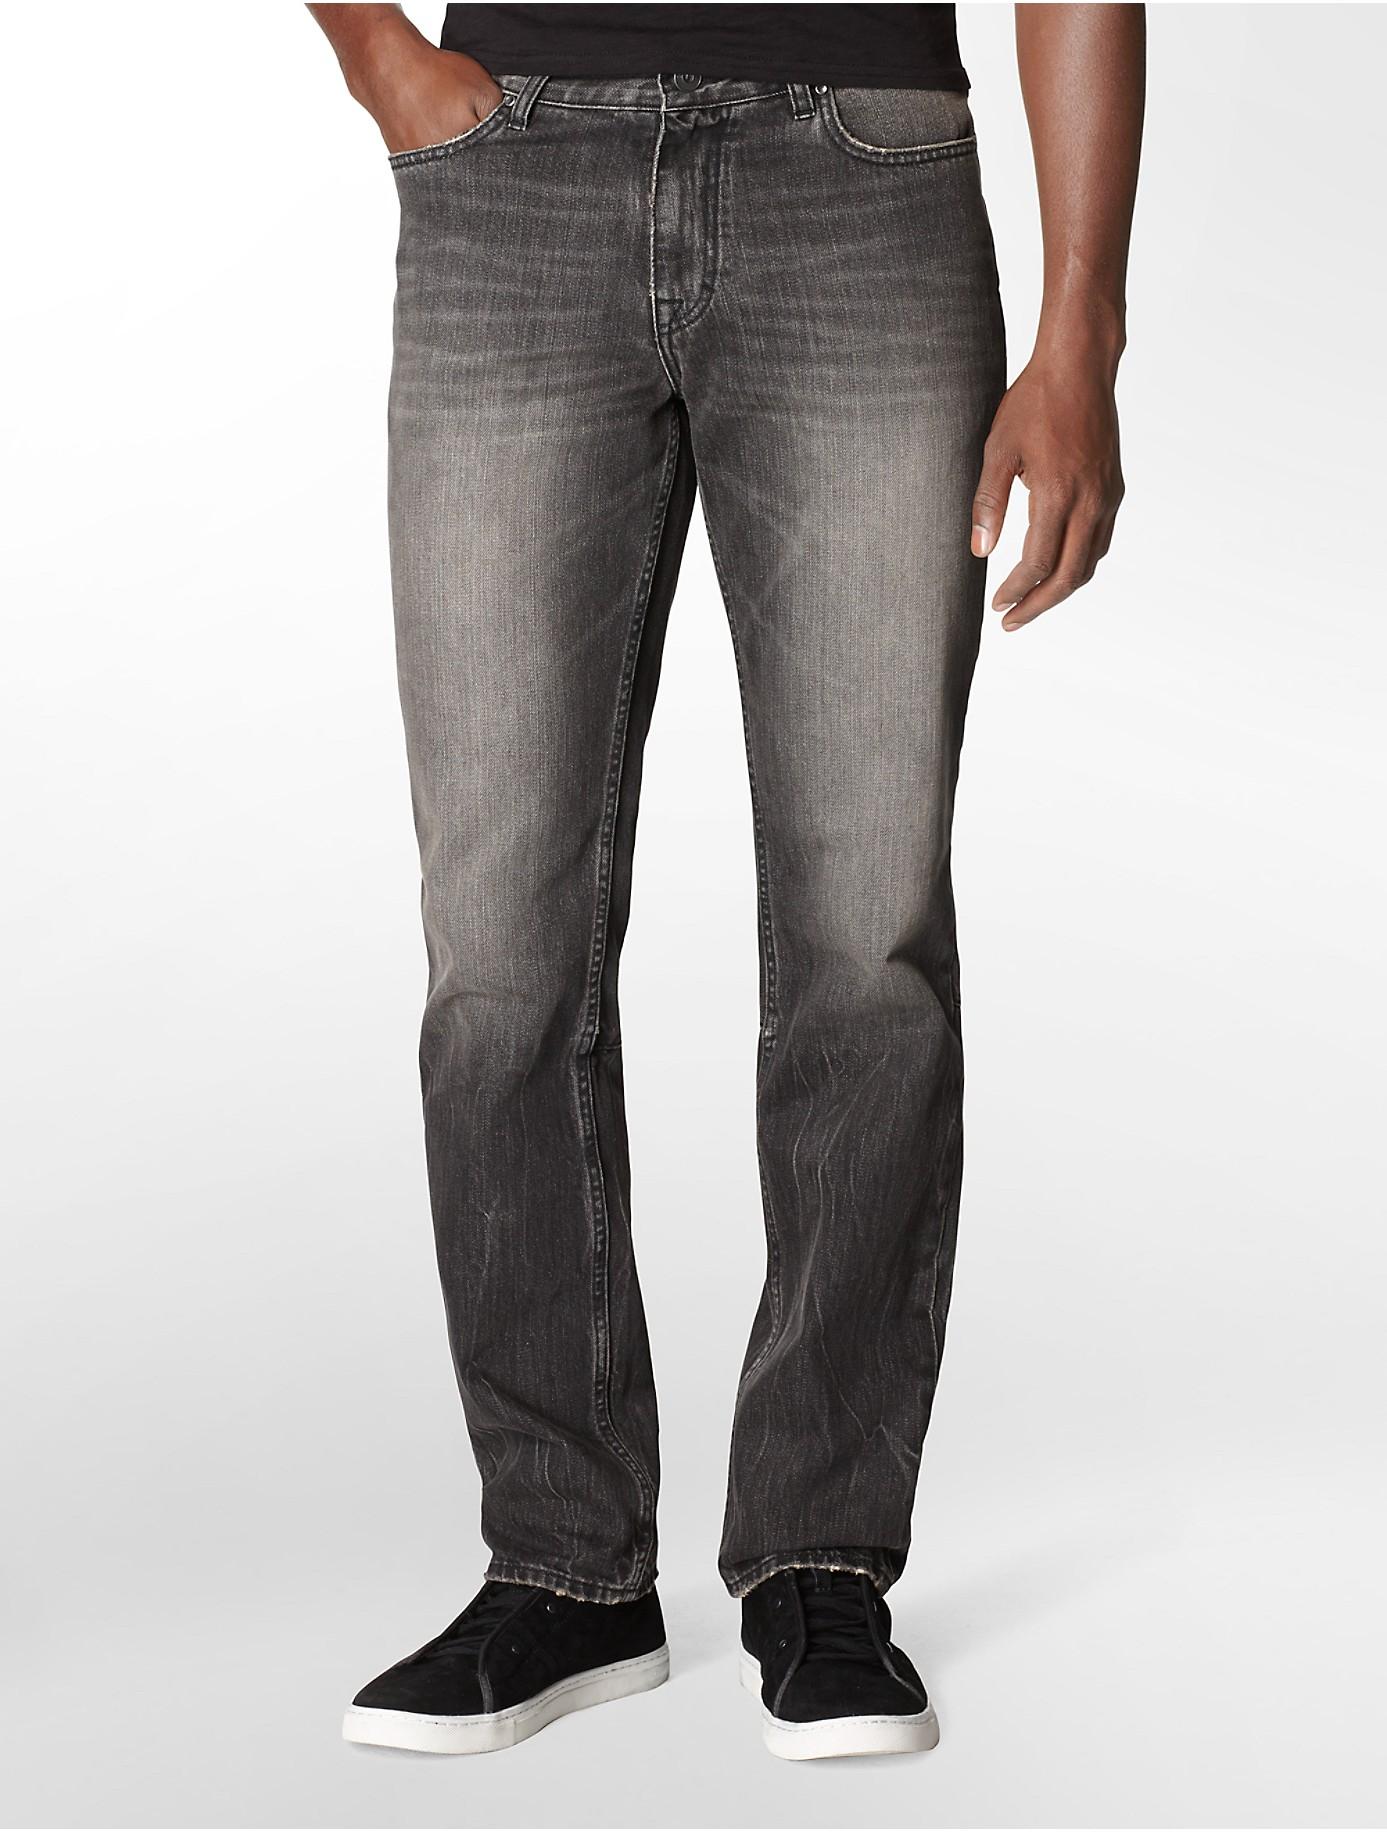 calvin klein jeans slim straight leg washed shadow rinse. Black Bedroom Furniture Sets. Home Design Ideas